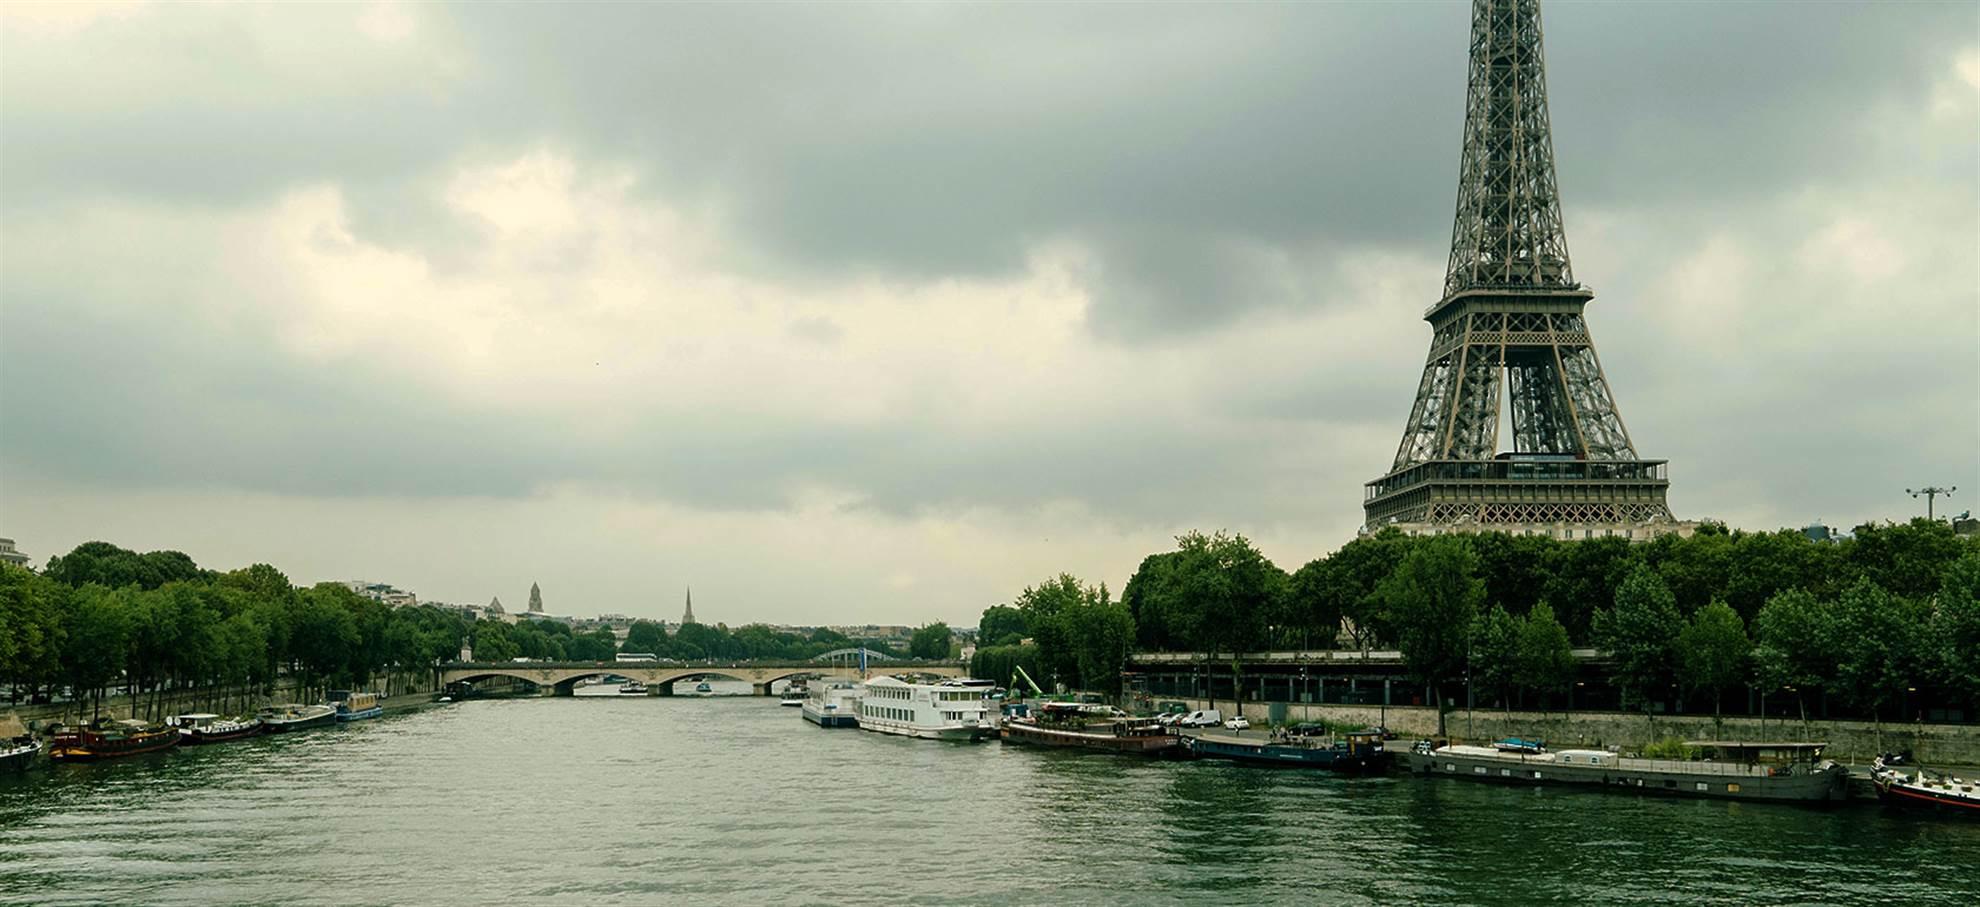 Parijs City Tour & Seine Rivier Cruise